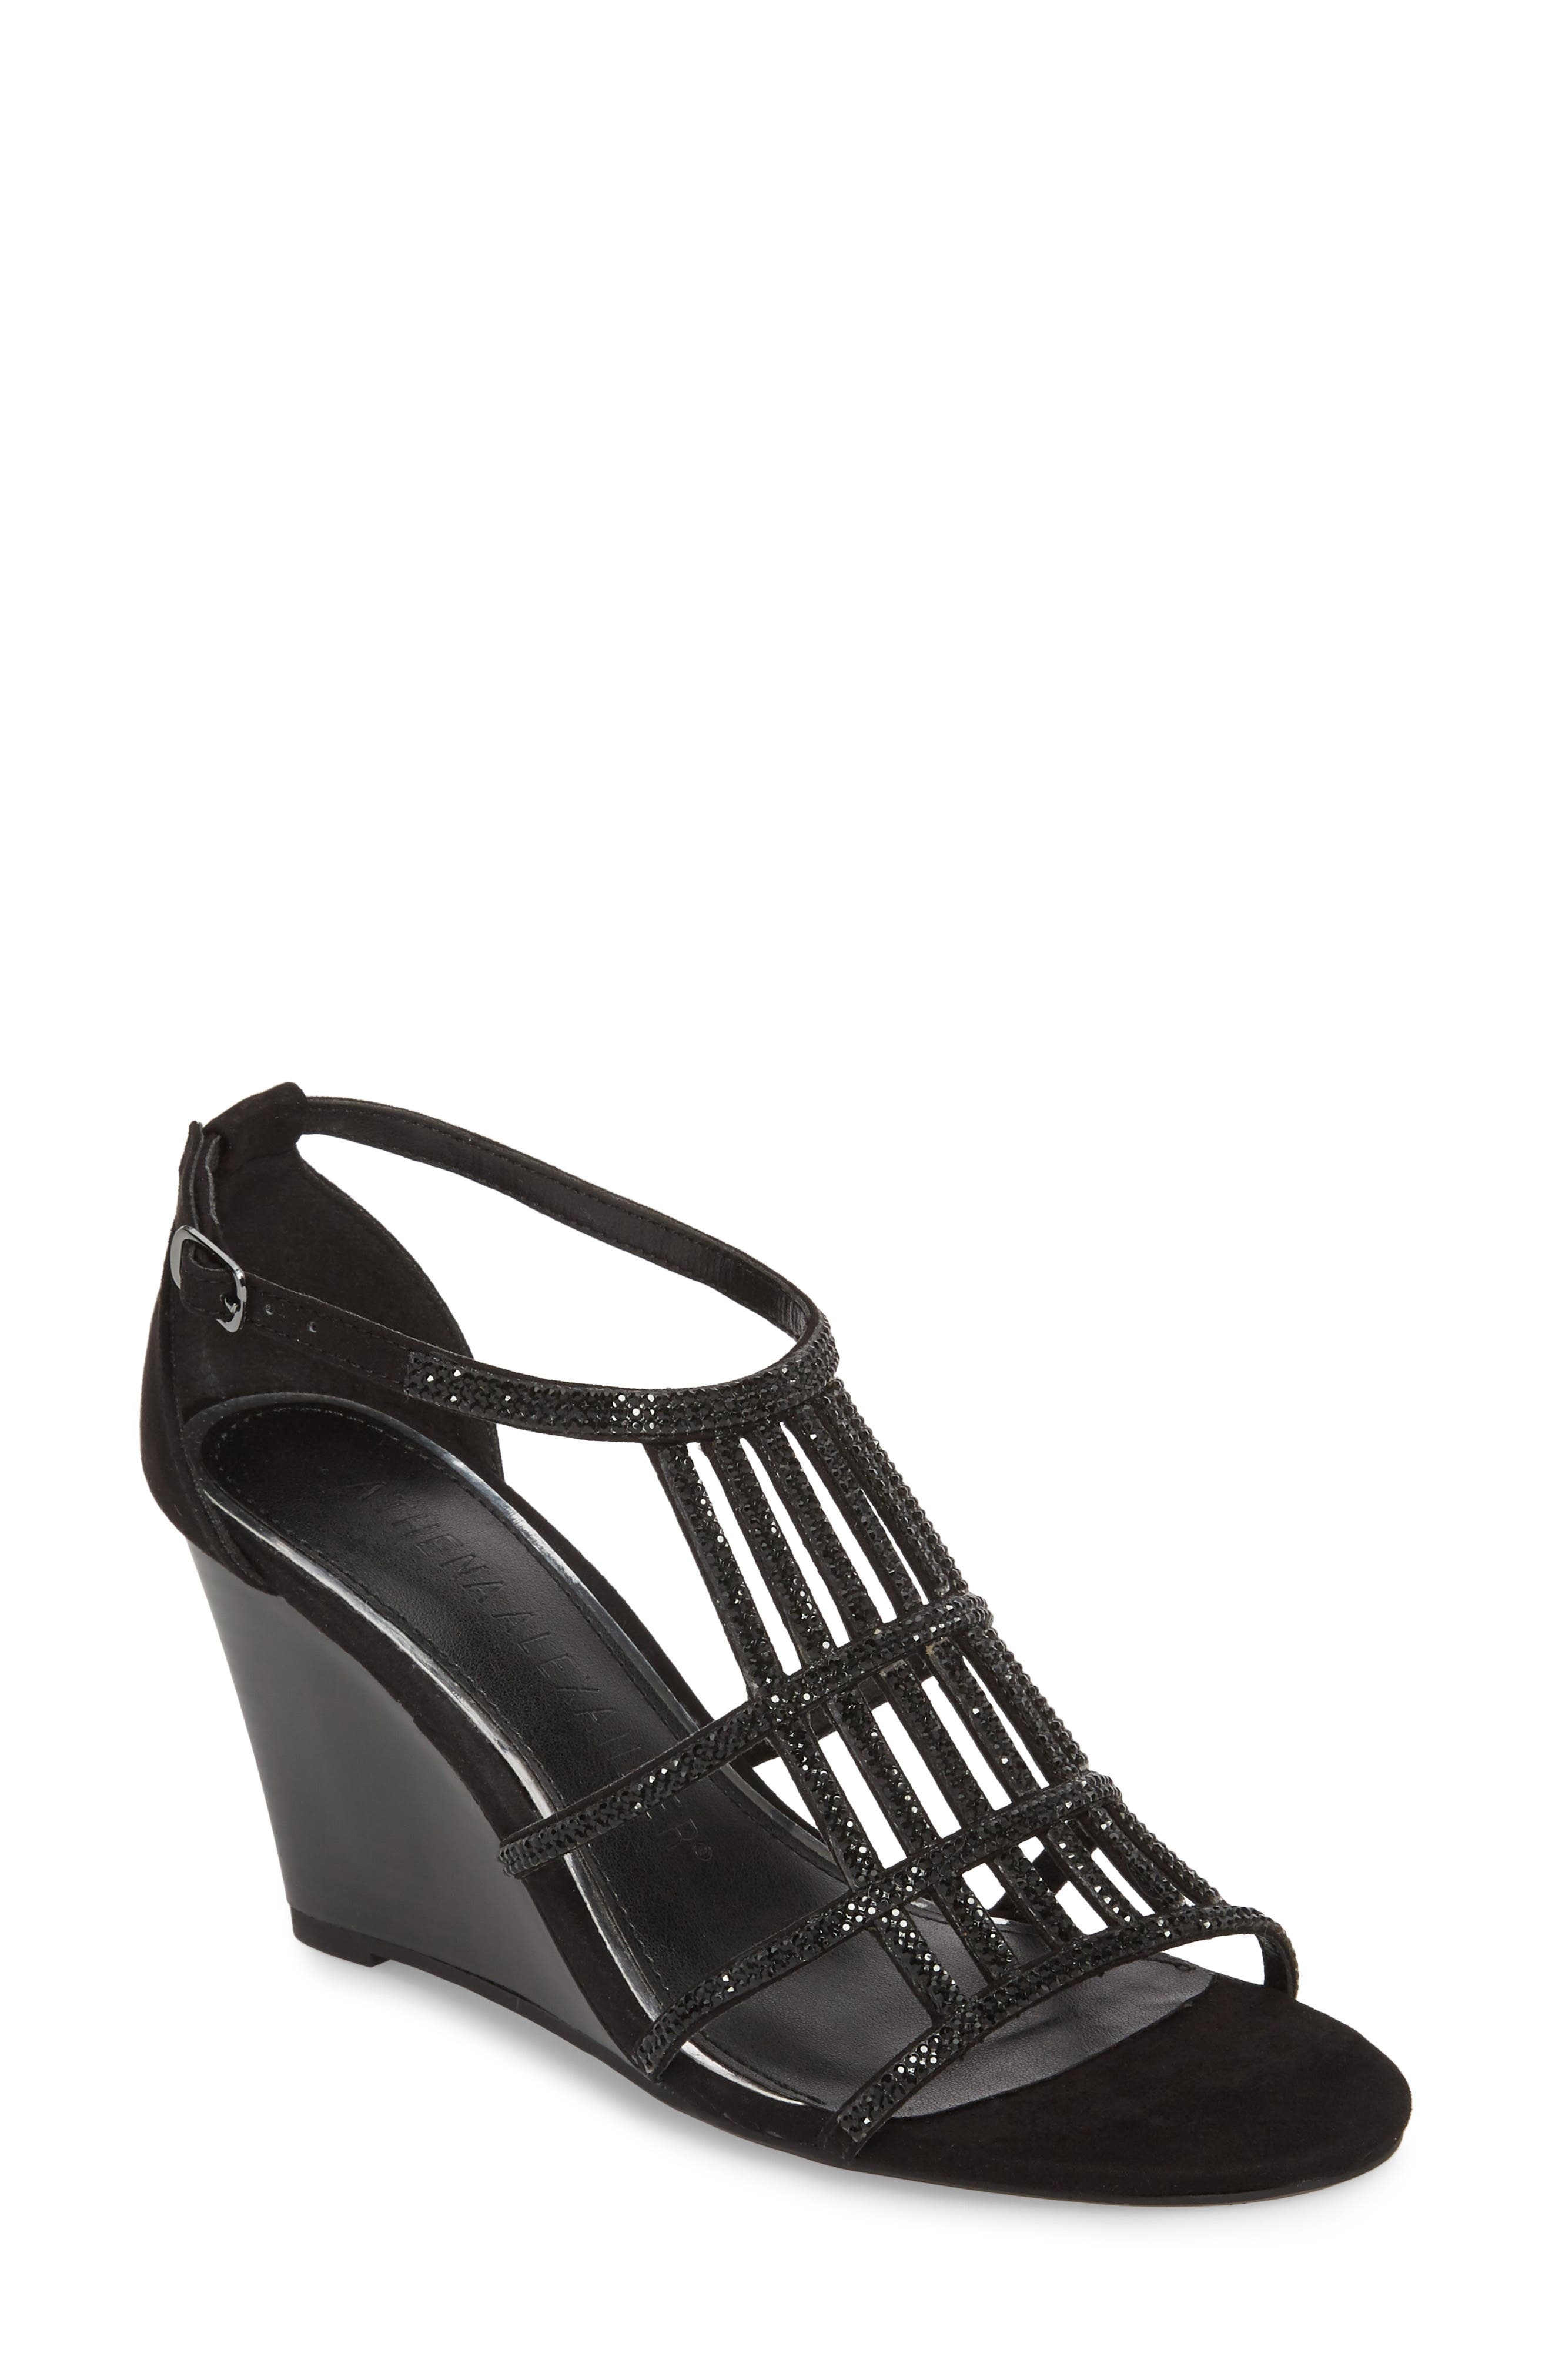 Hampton Crystal Embellished Wedge Sandal,                             Main thumbnail 1, color,                             BLACK SUEDE